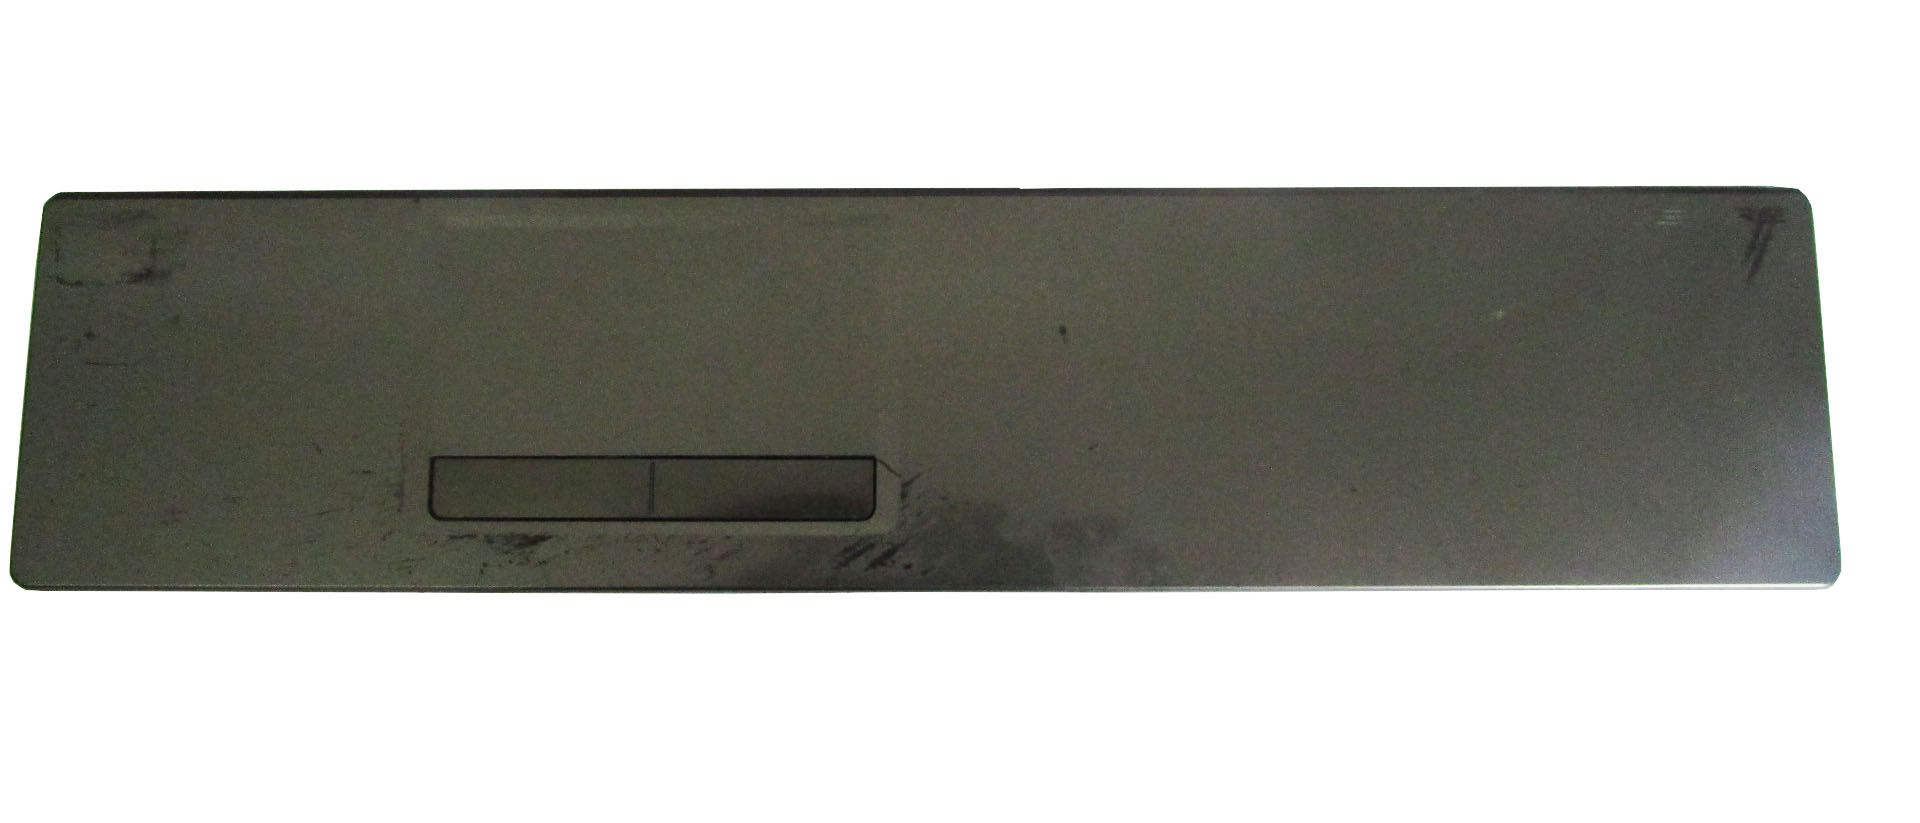 Touchpad Notebook Acer Aspire V3-571g P/N: Ap0n7000200 (semi novo)